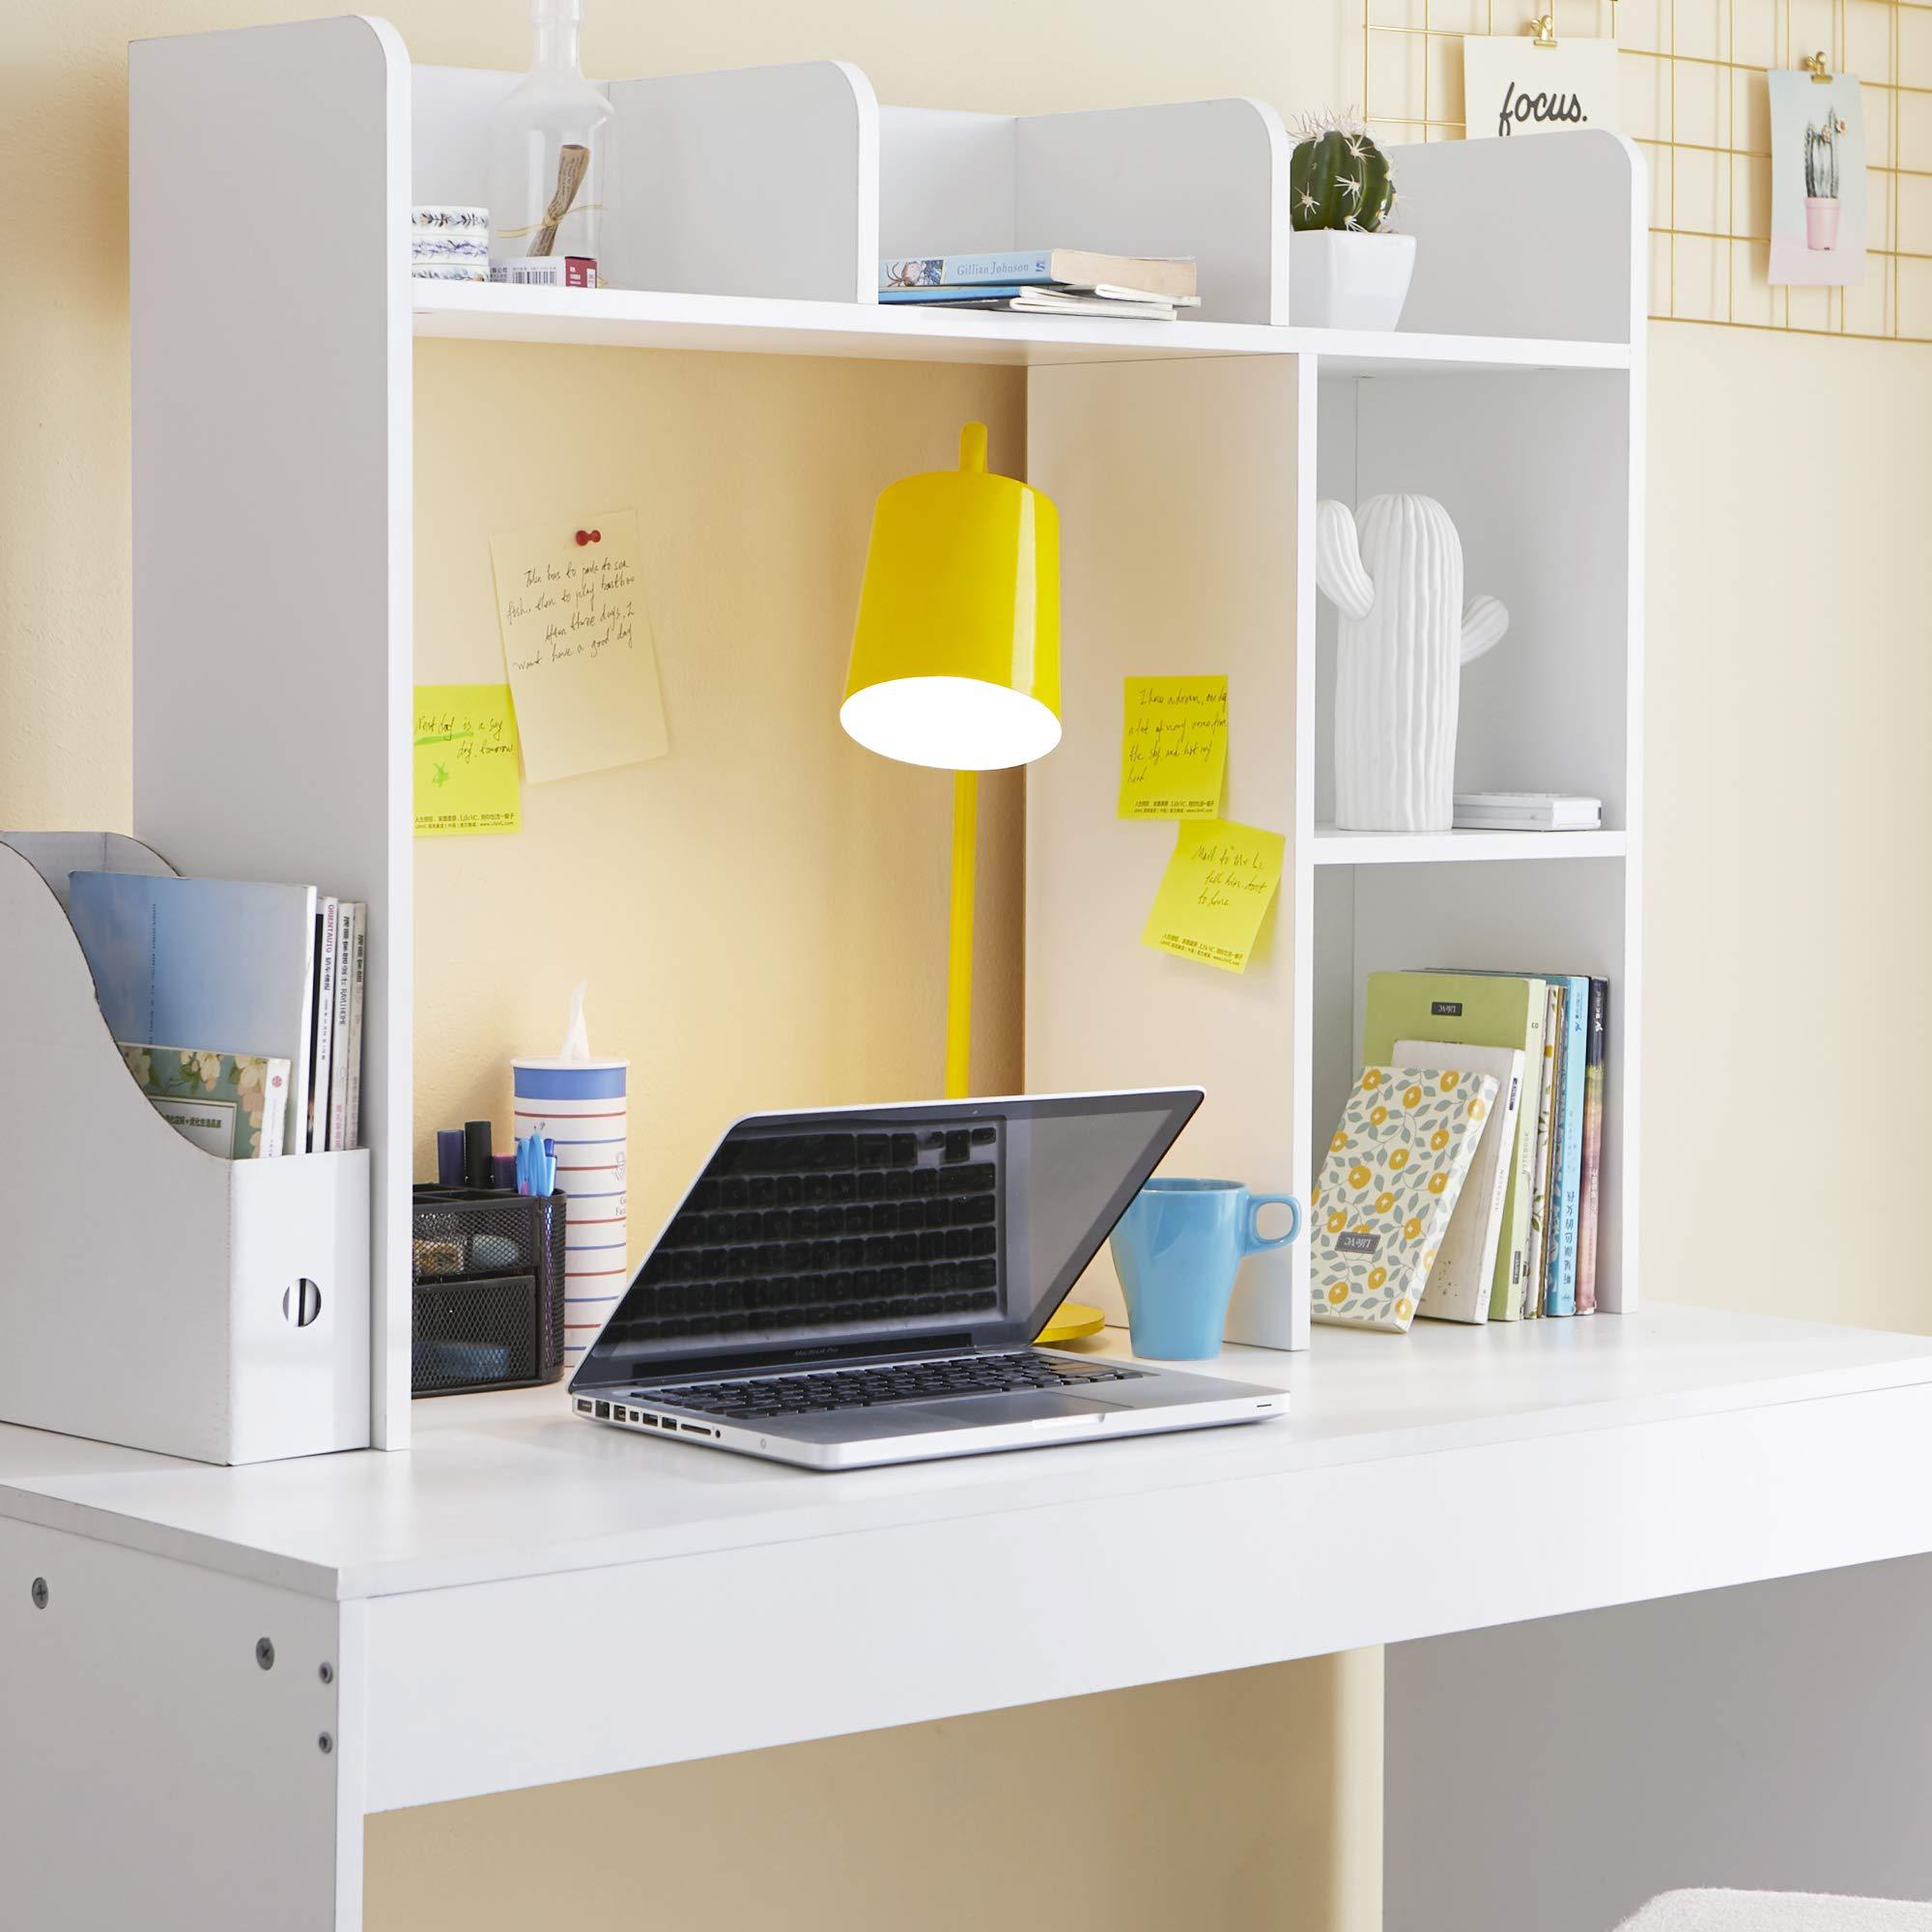 DormCo Classic Desk Bookshelf - White by DormCo (Image #3)